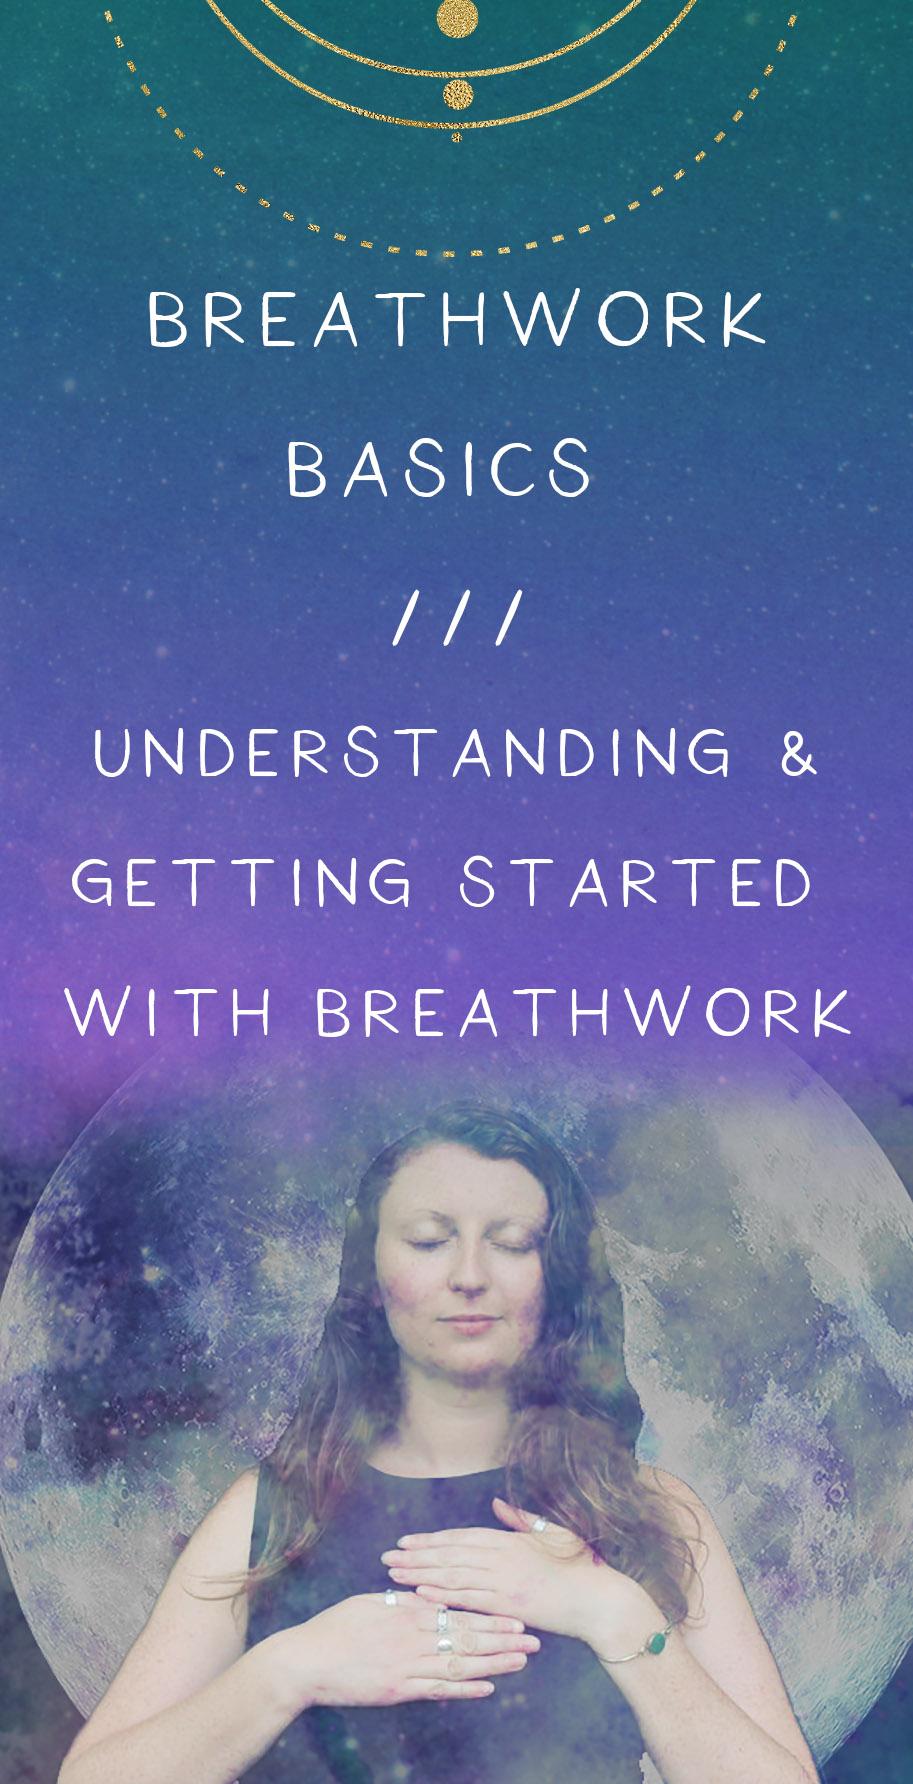 undestanding-breathwork breathwork basics breathwork 101